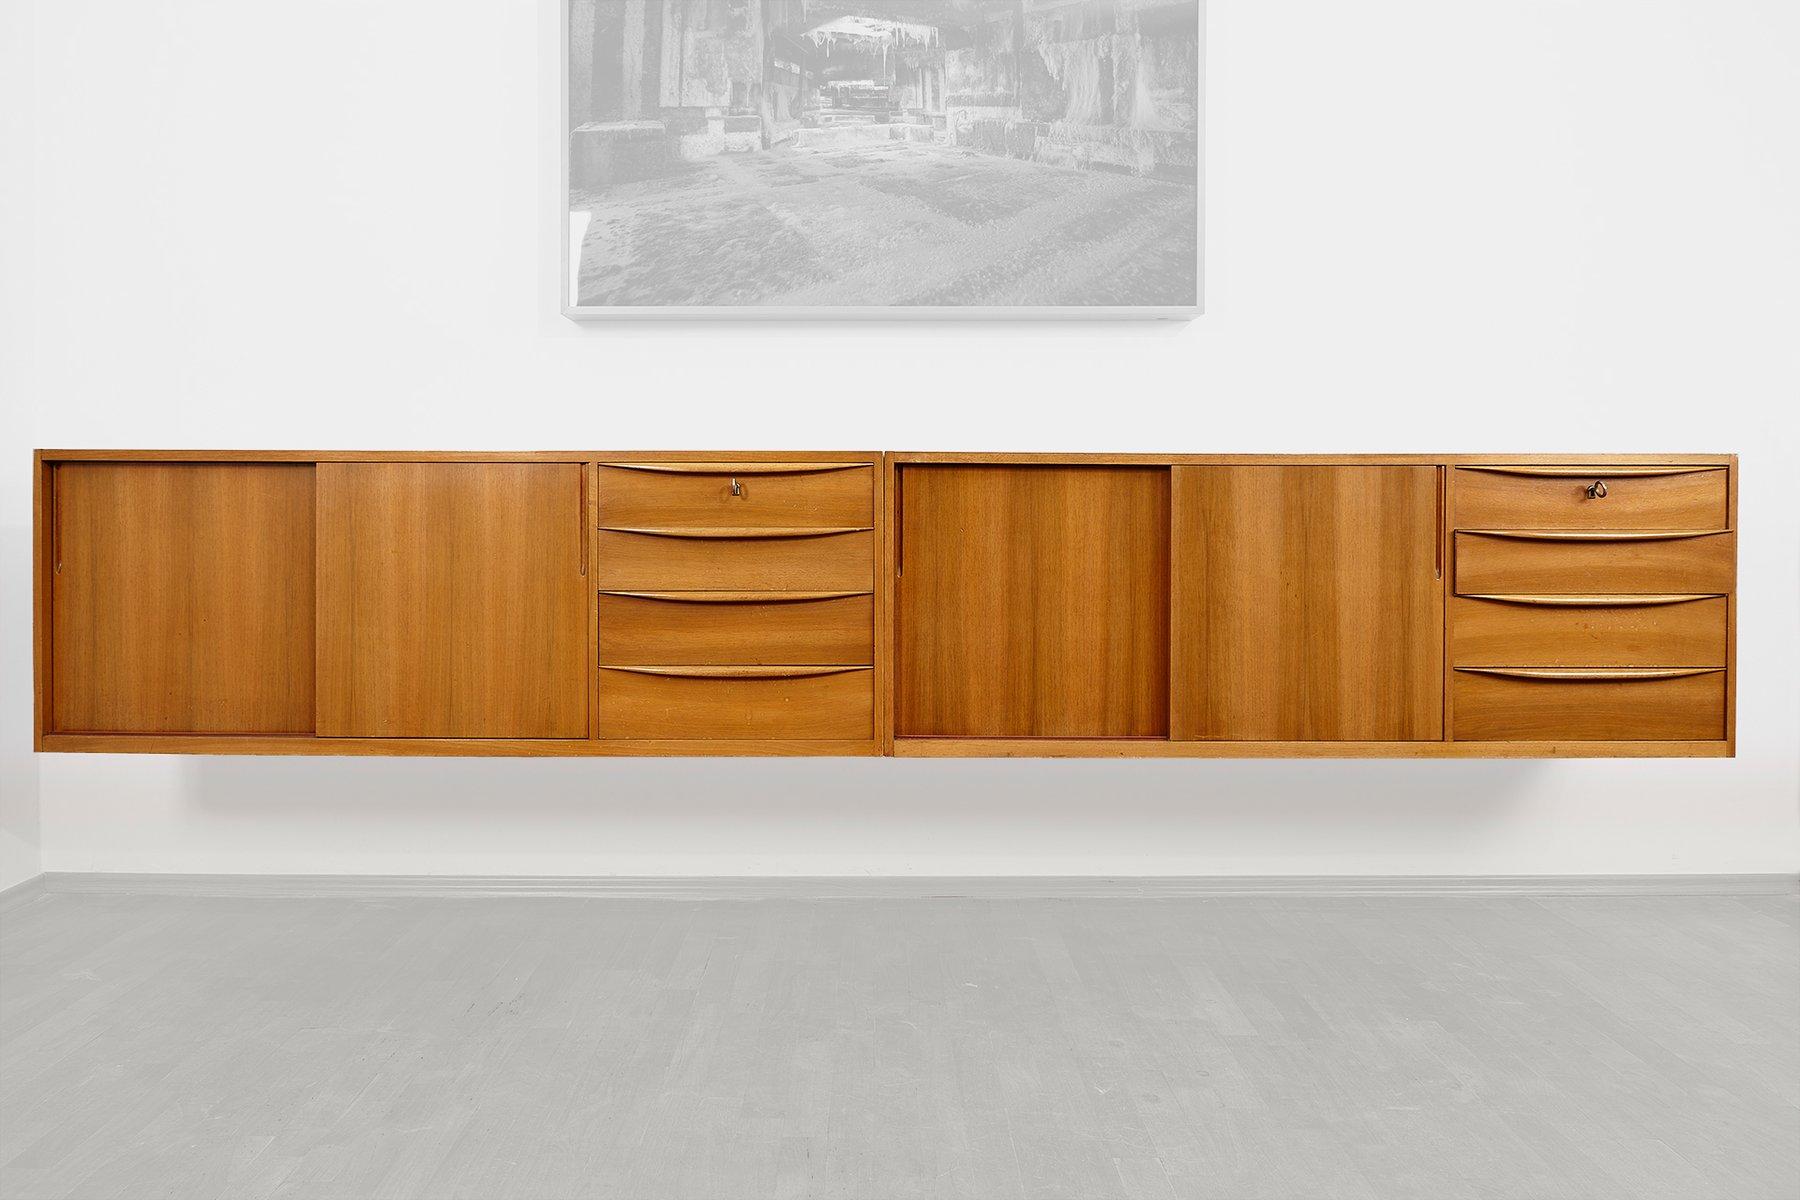 Hängende Sideboards von WK Möbel, 1960er, 2er Set